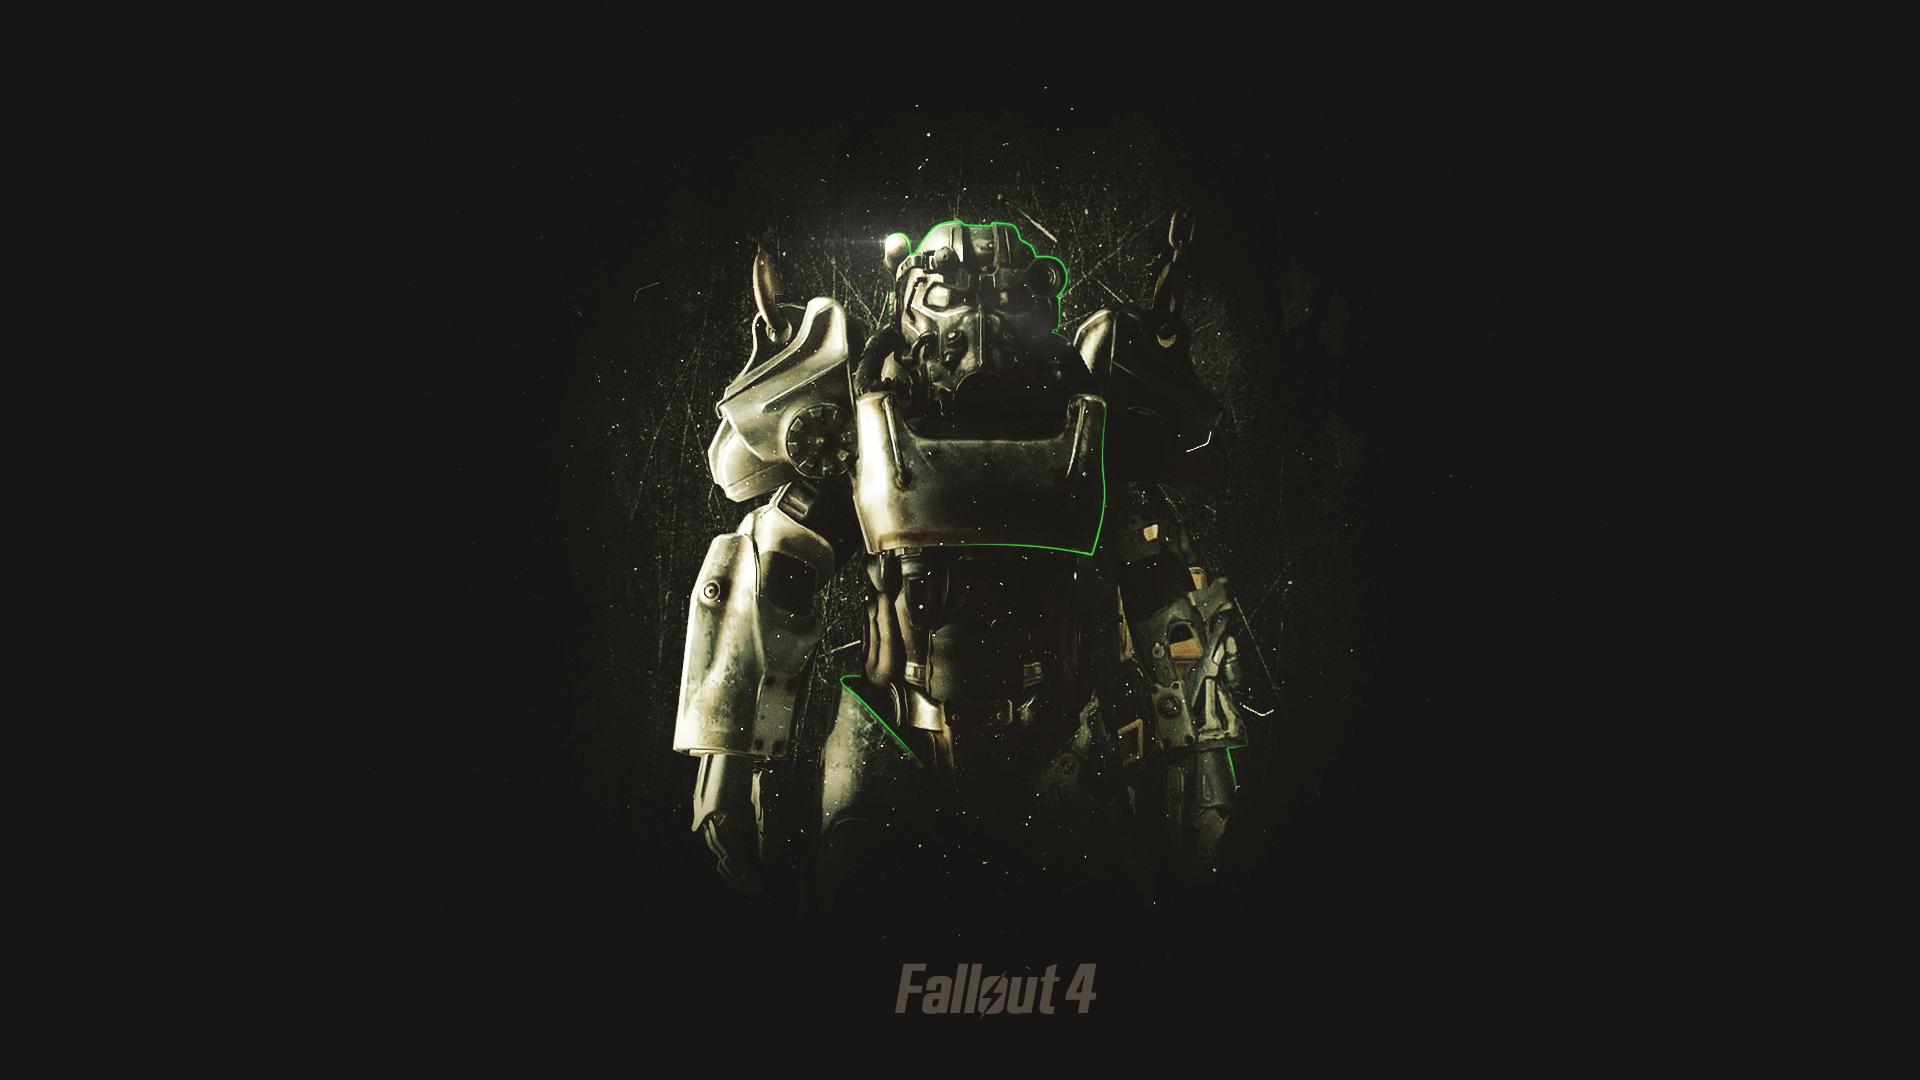 Great Wallpaper Logo Fallout 4 - fallout-4-hd-image  2018_712215.jpg